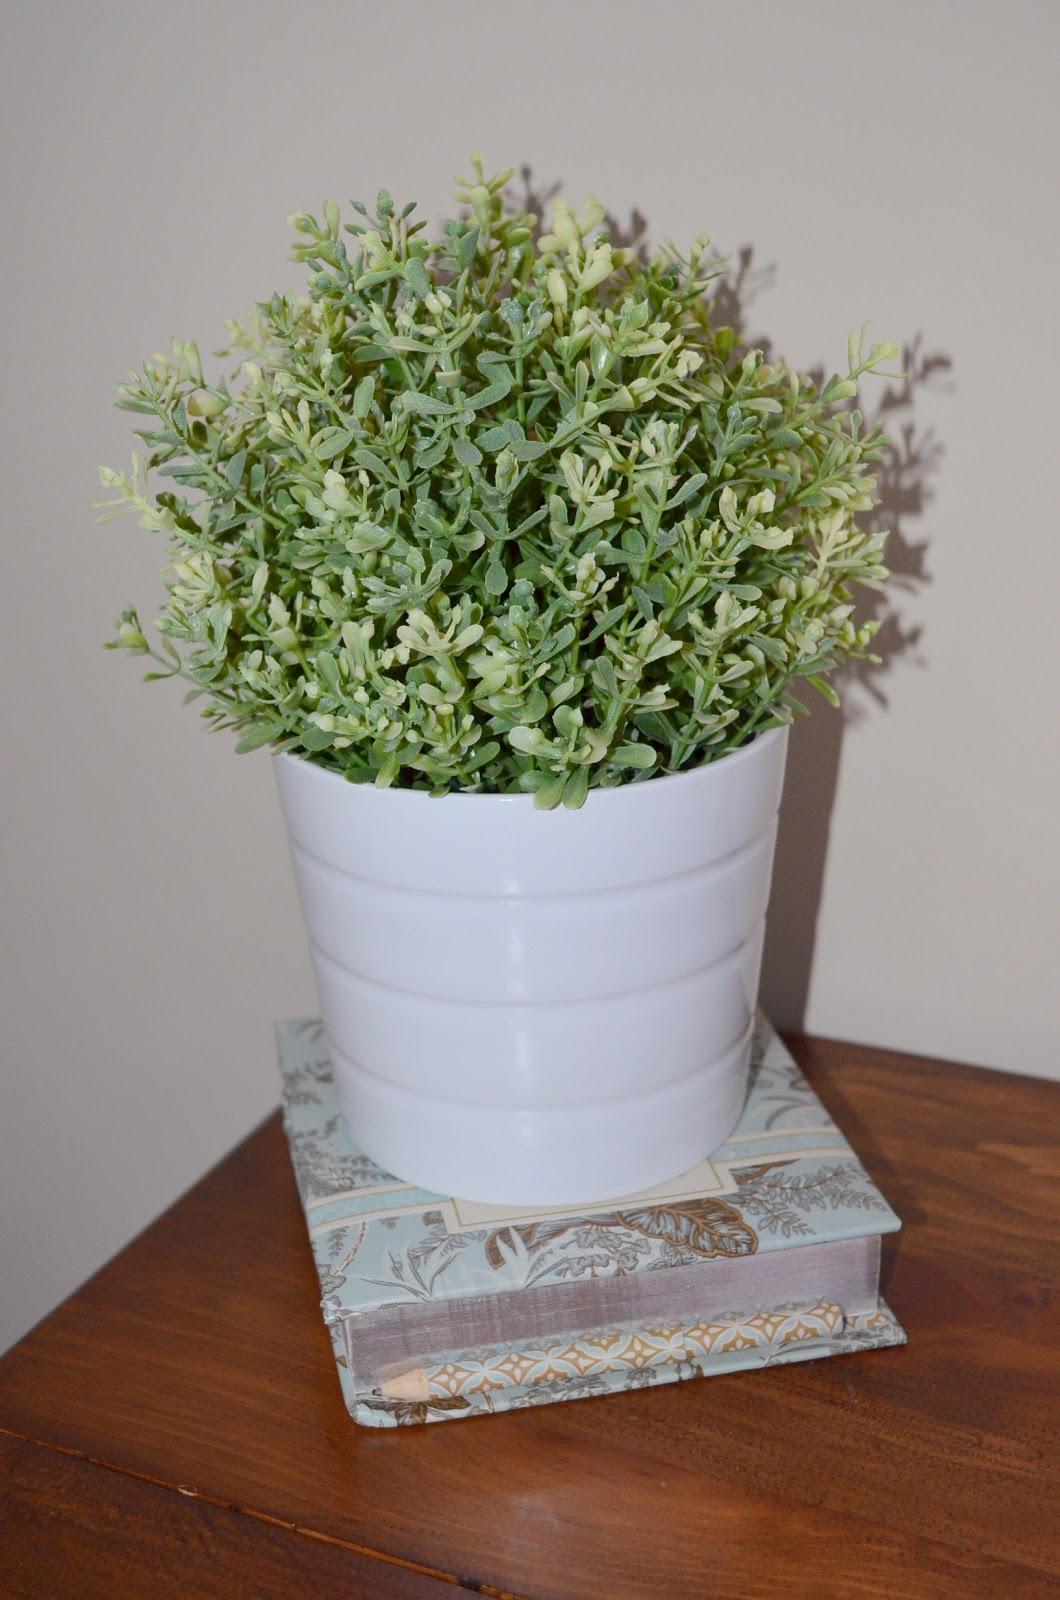 ikea vase and plant